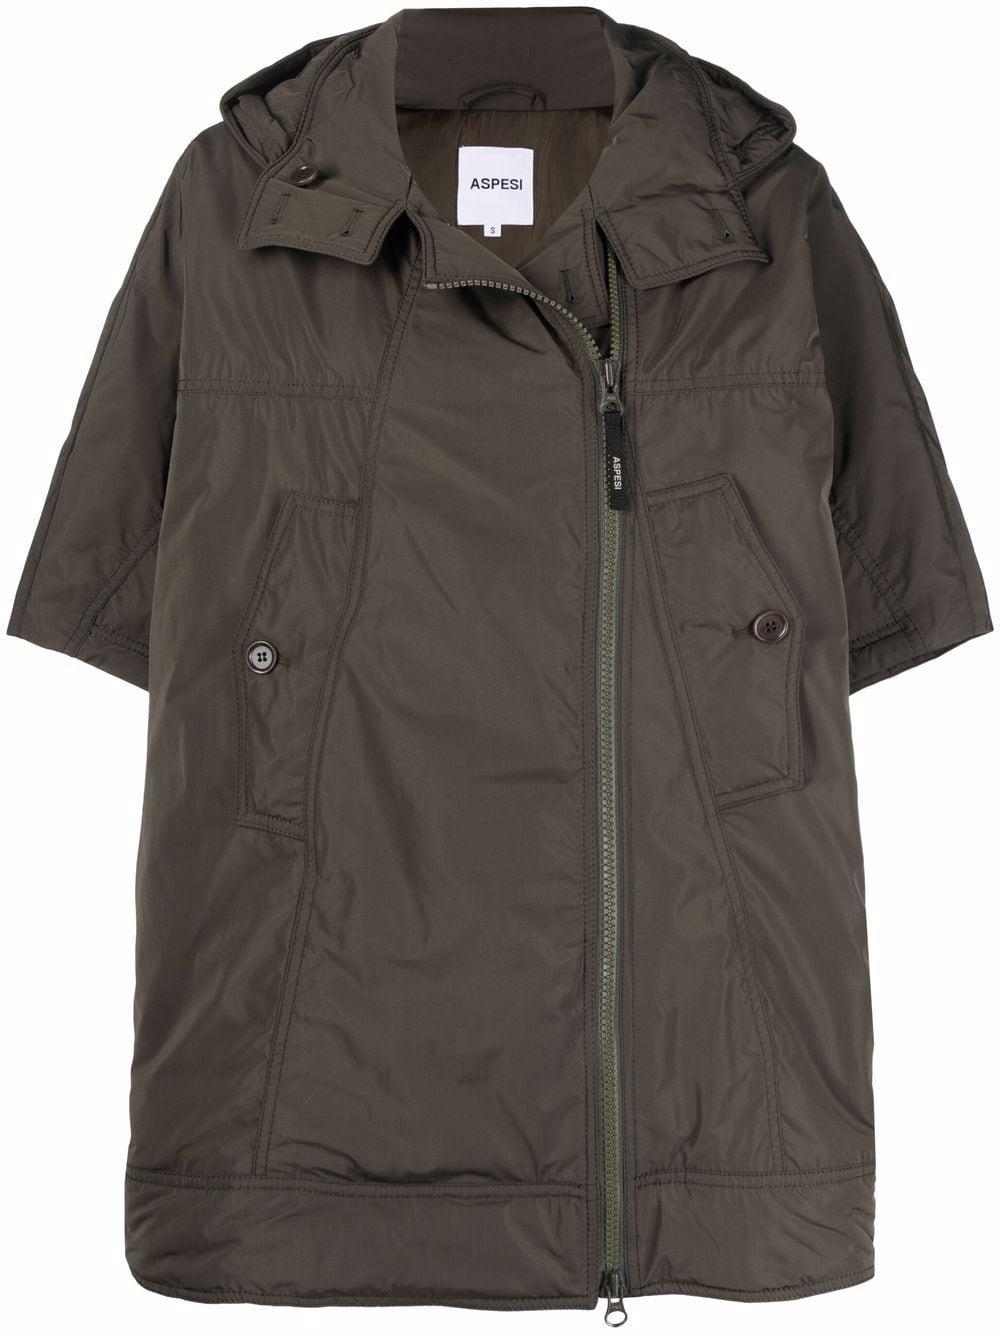 Military green zip-up hooded coat featuring ASPESI      1N08-G70301237